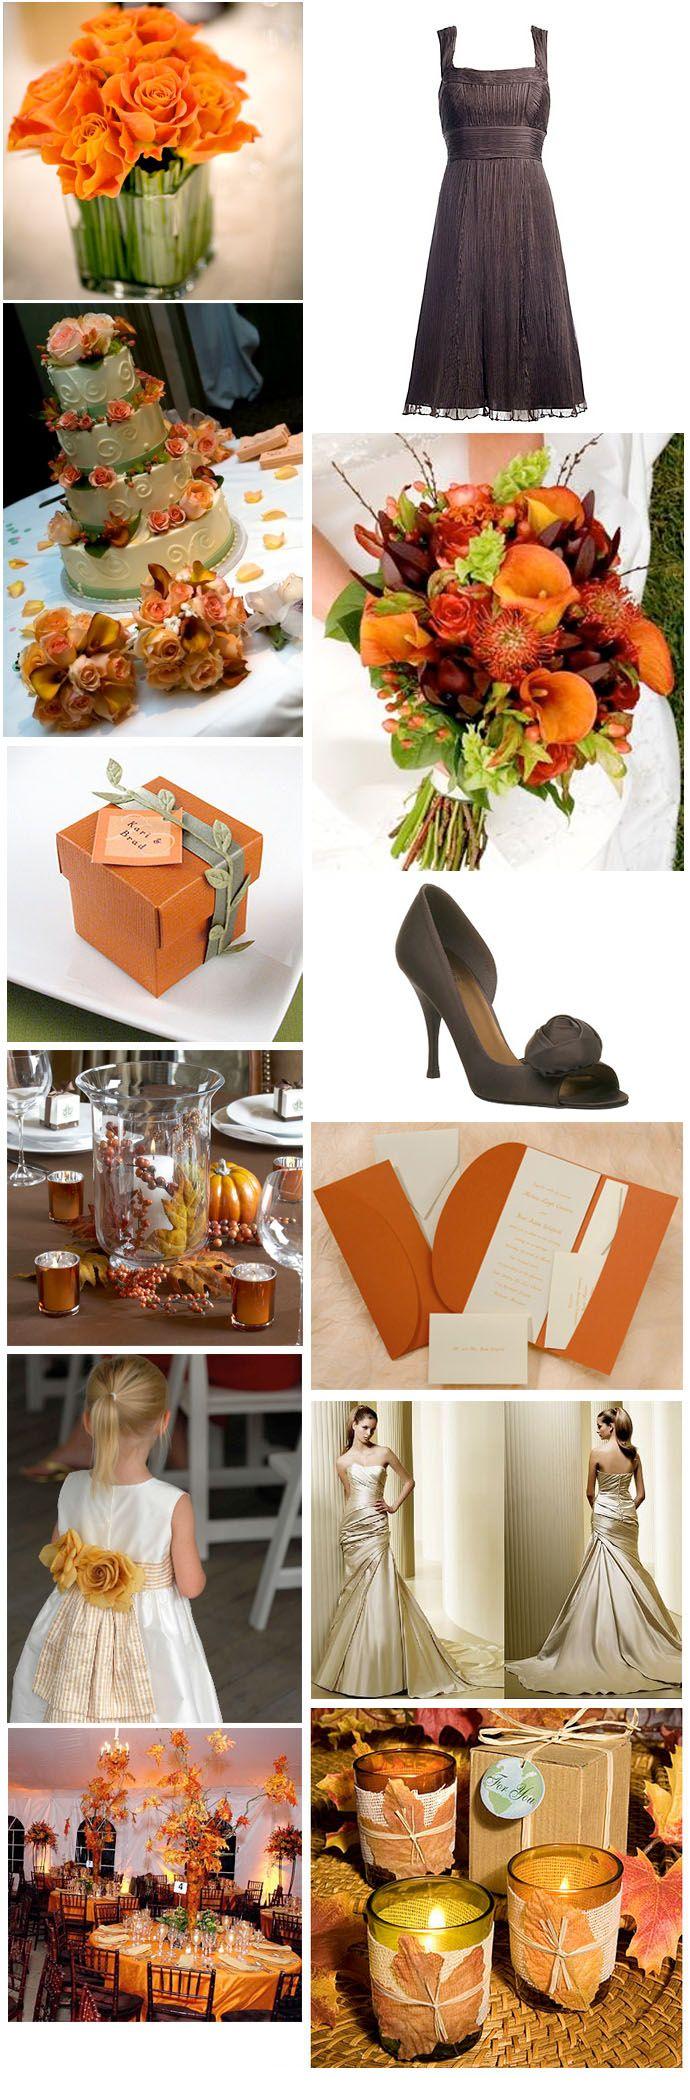 193 best fall wedding flowers images on pinterest for Wedding themes for september